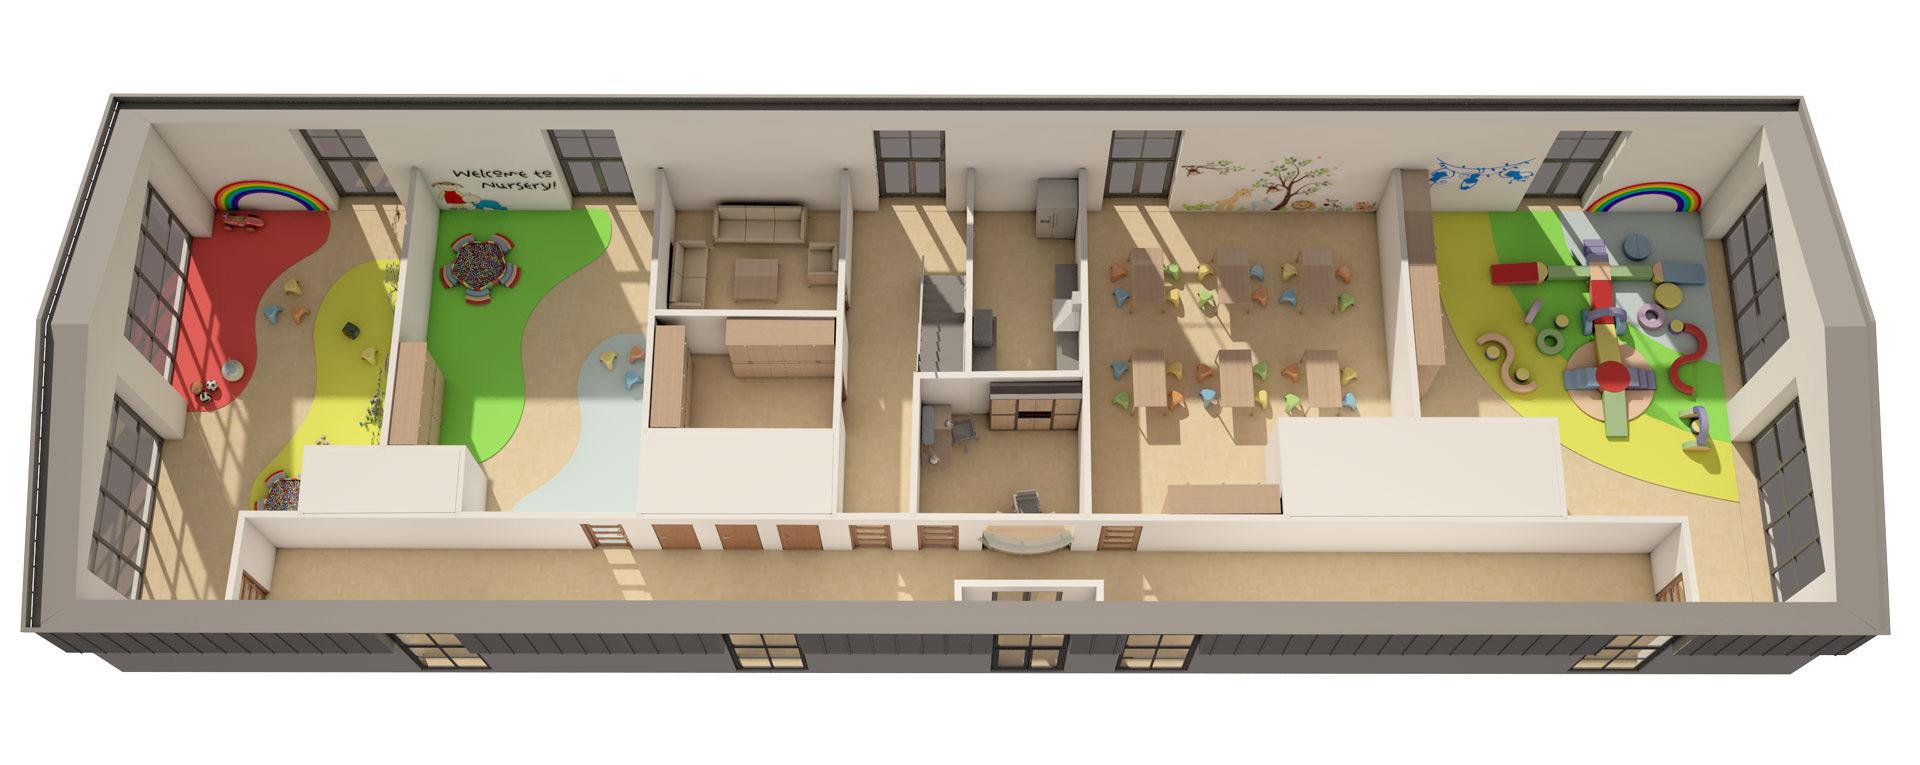 3D Floorplan CGI Imagery Digitail Illustration Interior